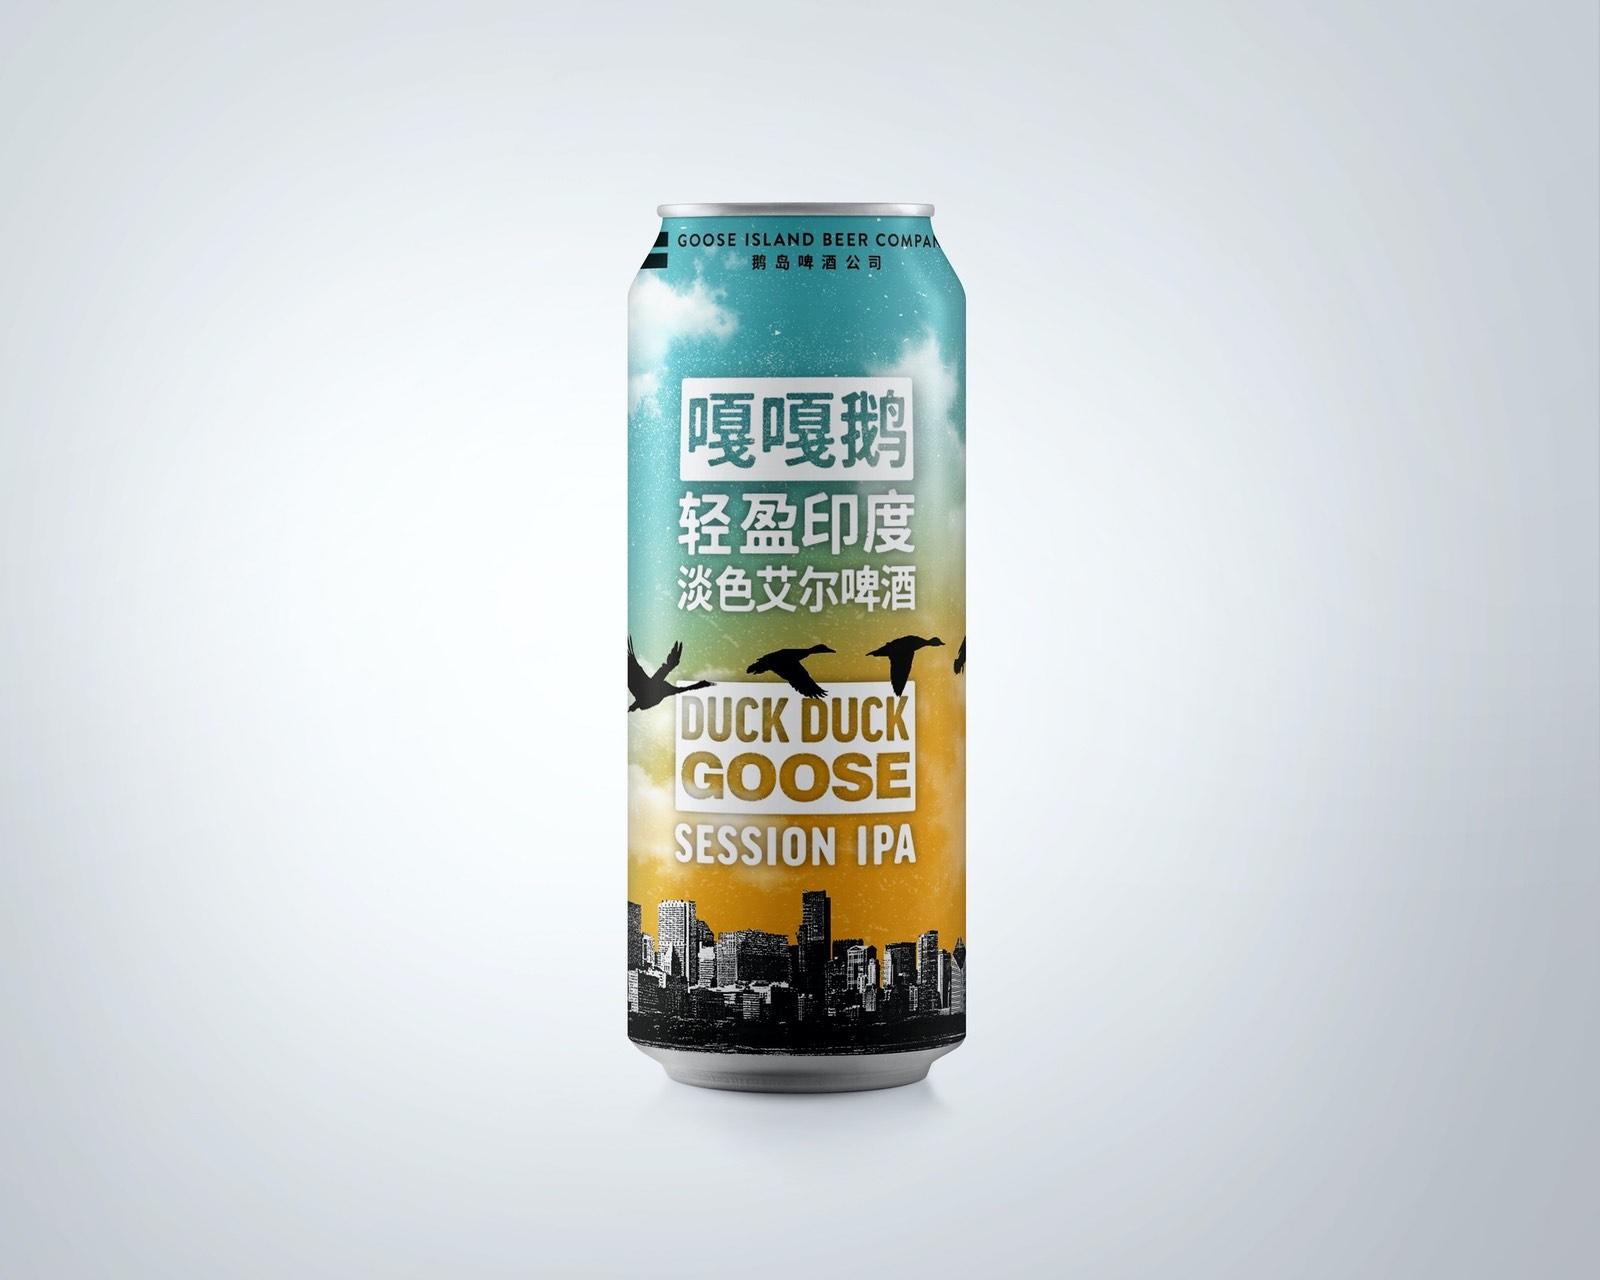 Goose-Island-DDGMockupName